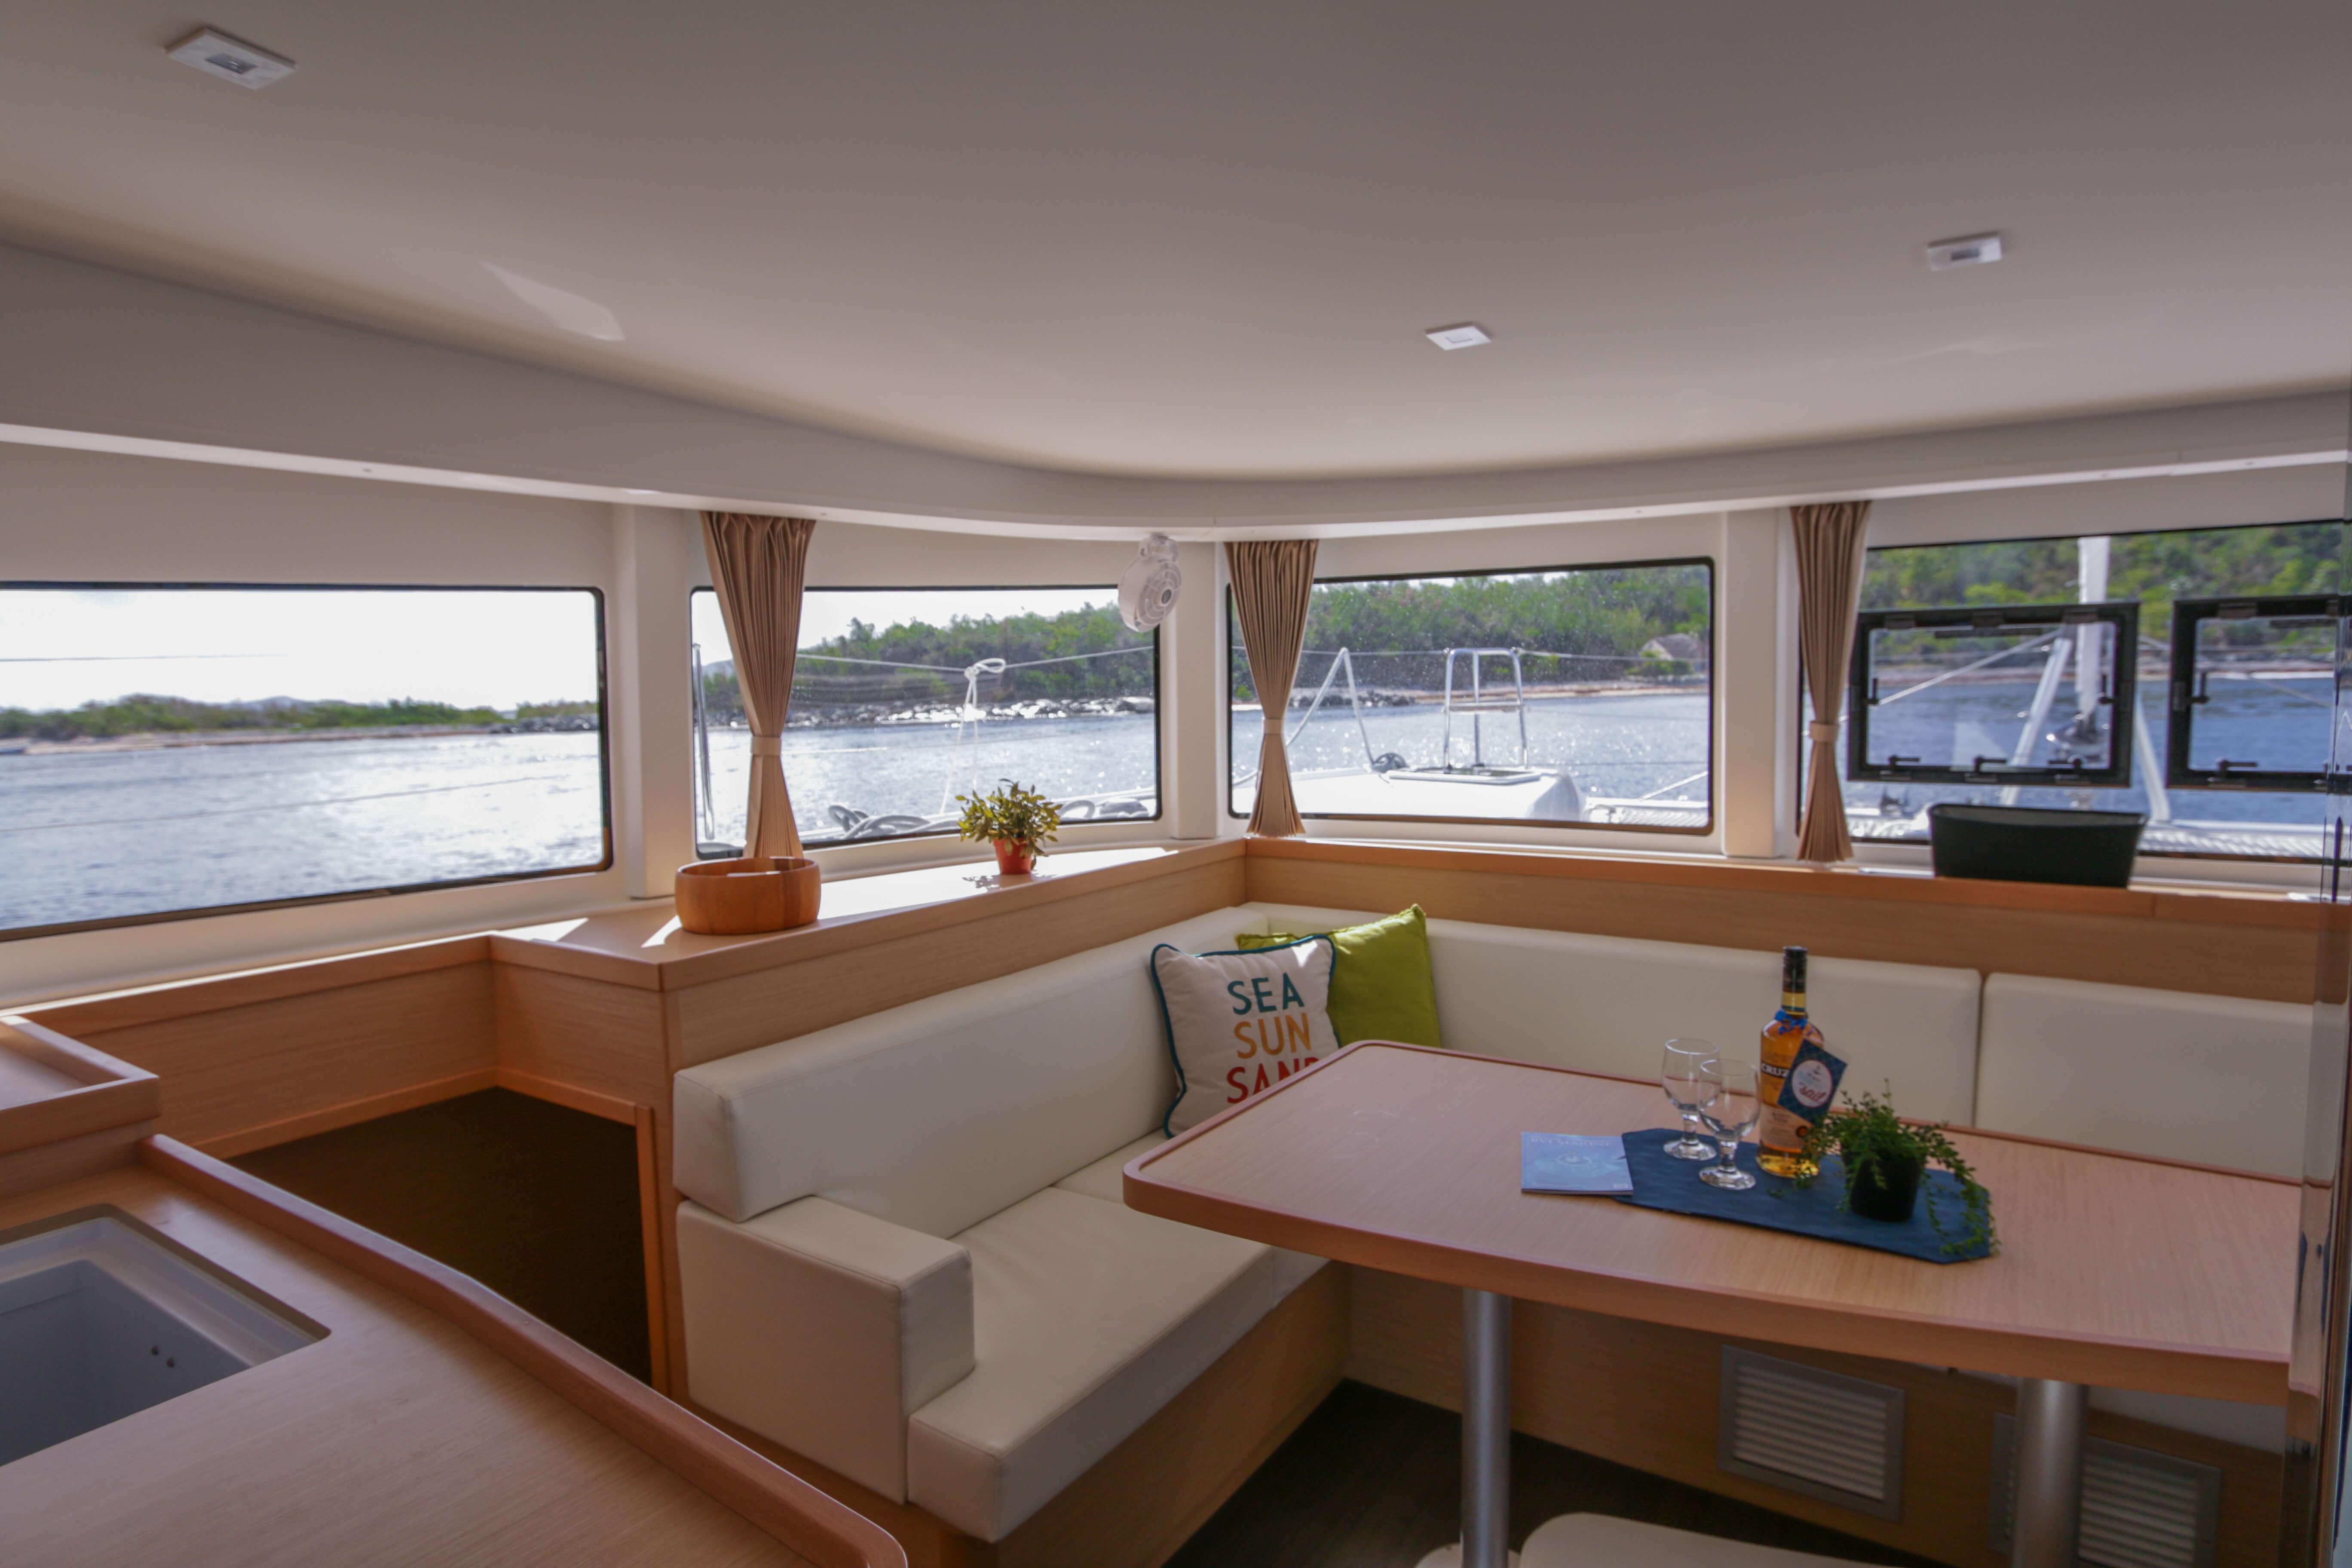 Used Sail Catamaran for Sale 2018 Lagoon 42 Layout & Accommodations